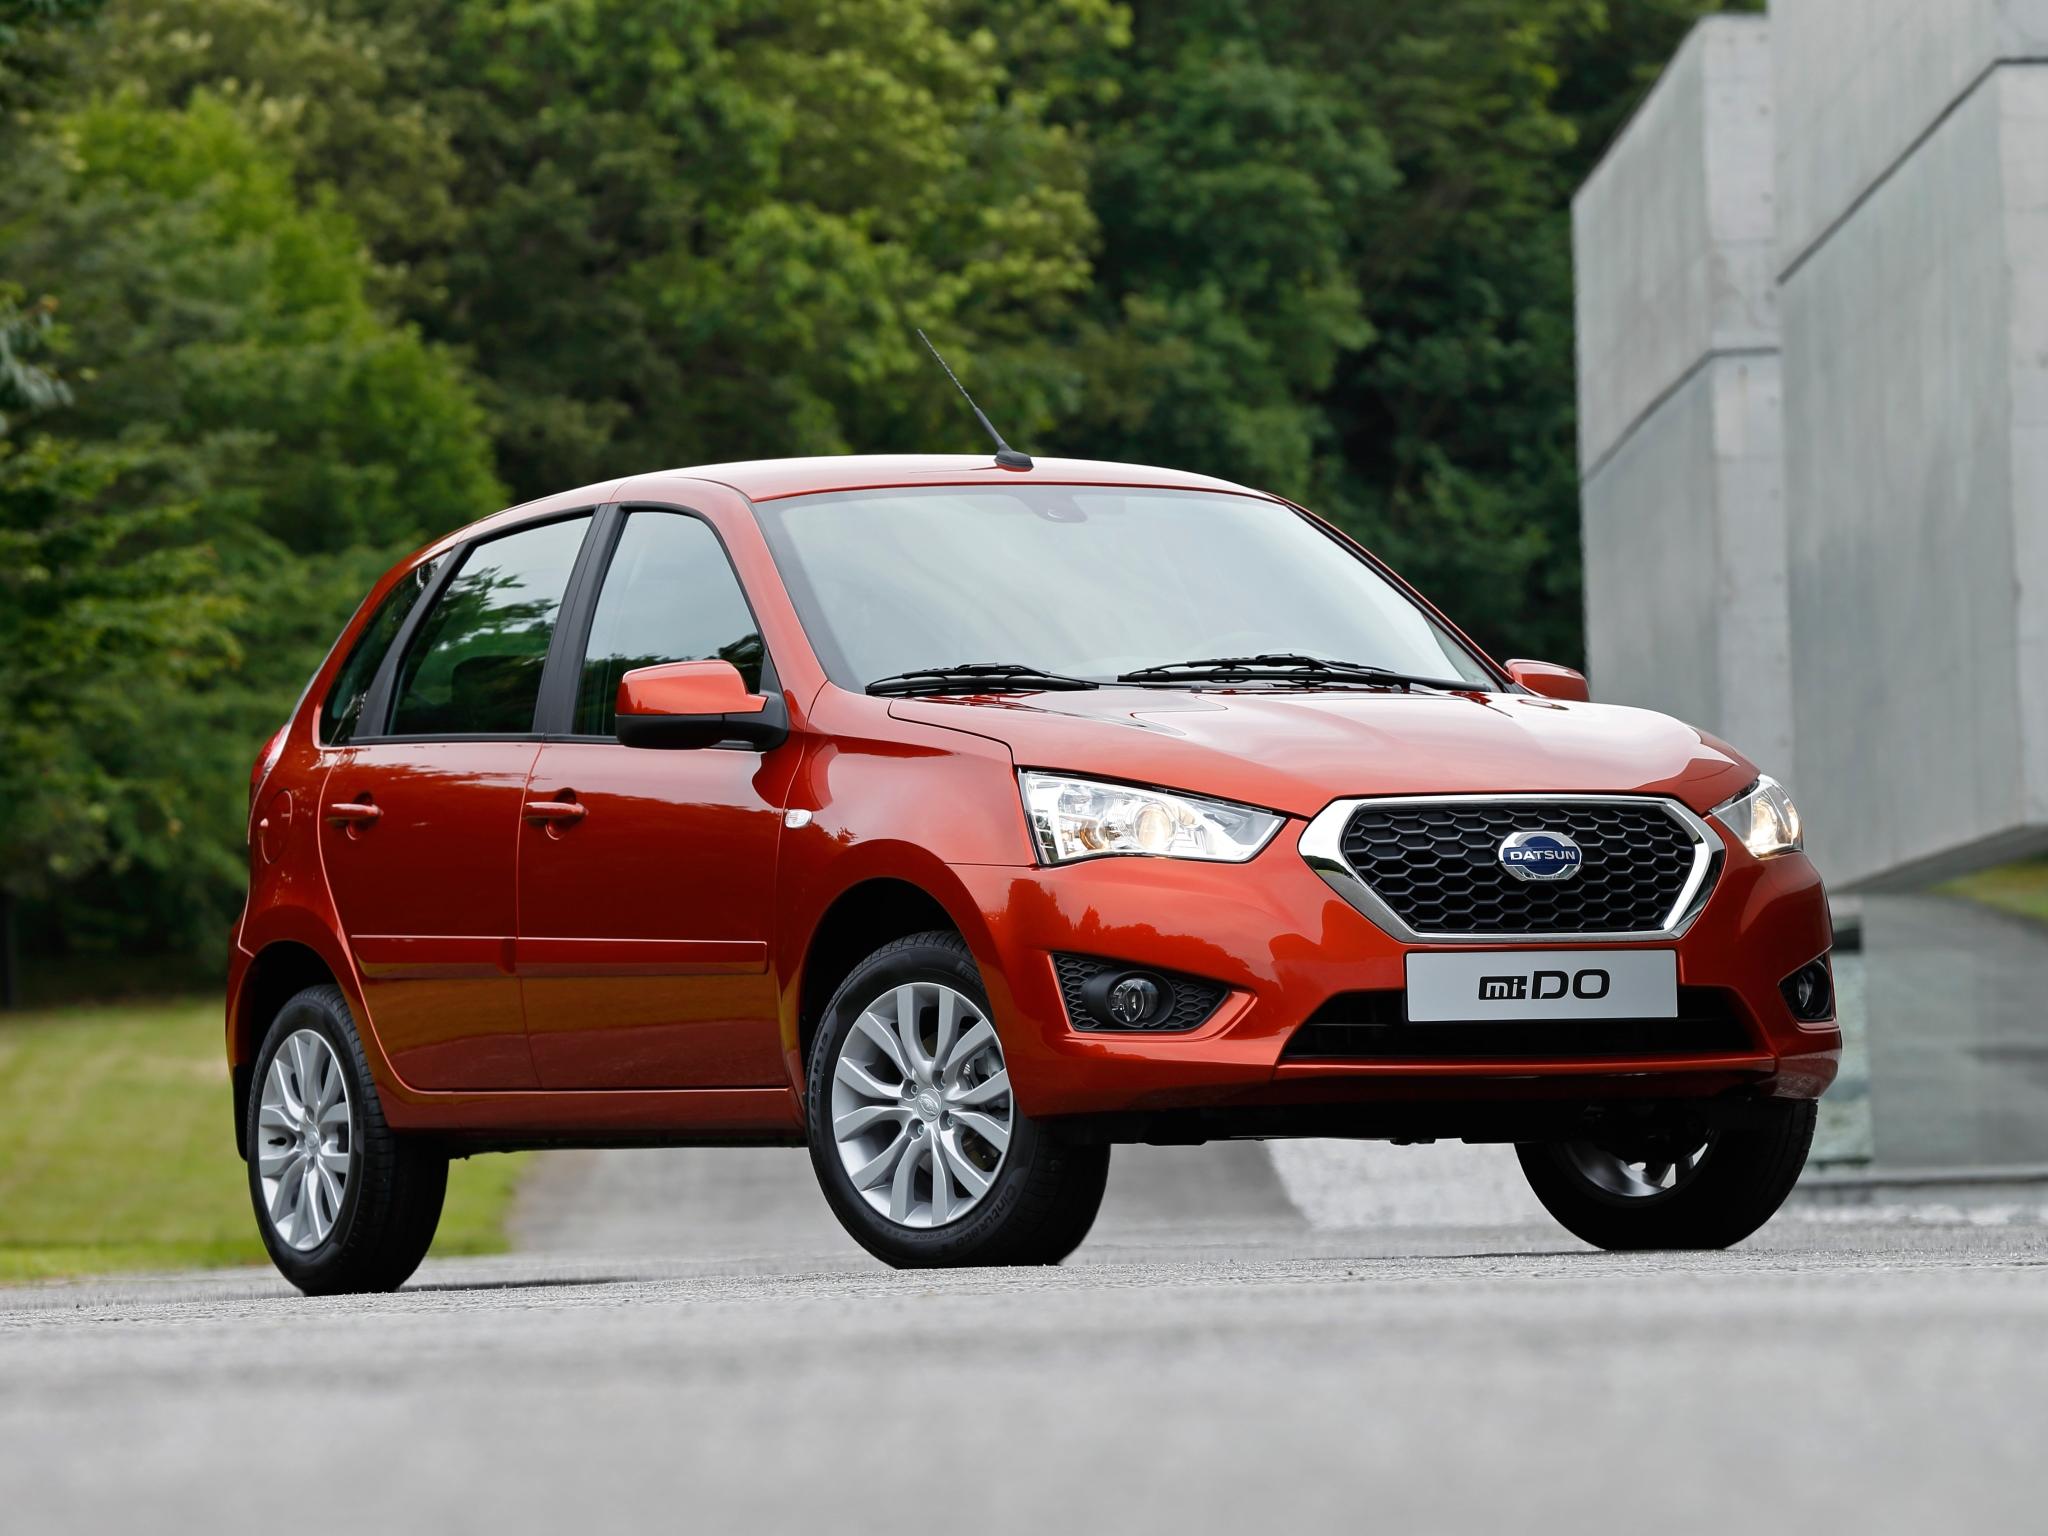 Datsun Reveals Mi-do Hatchback In Russia  Based On Lada Kalina  Video